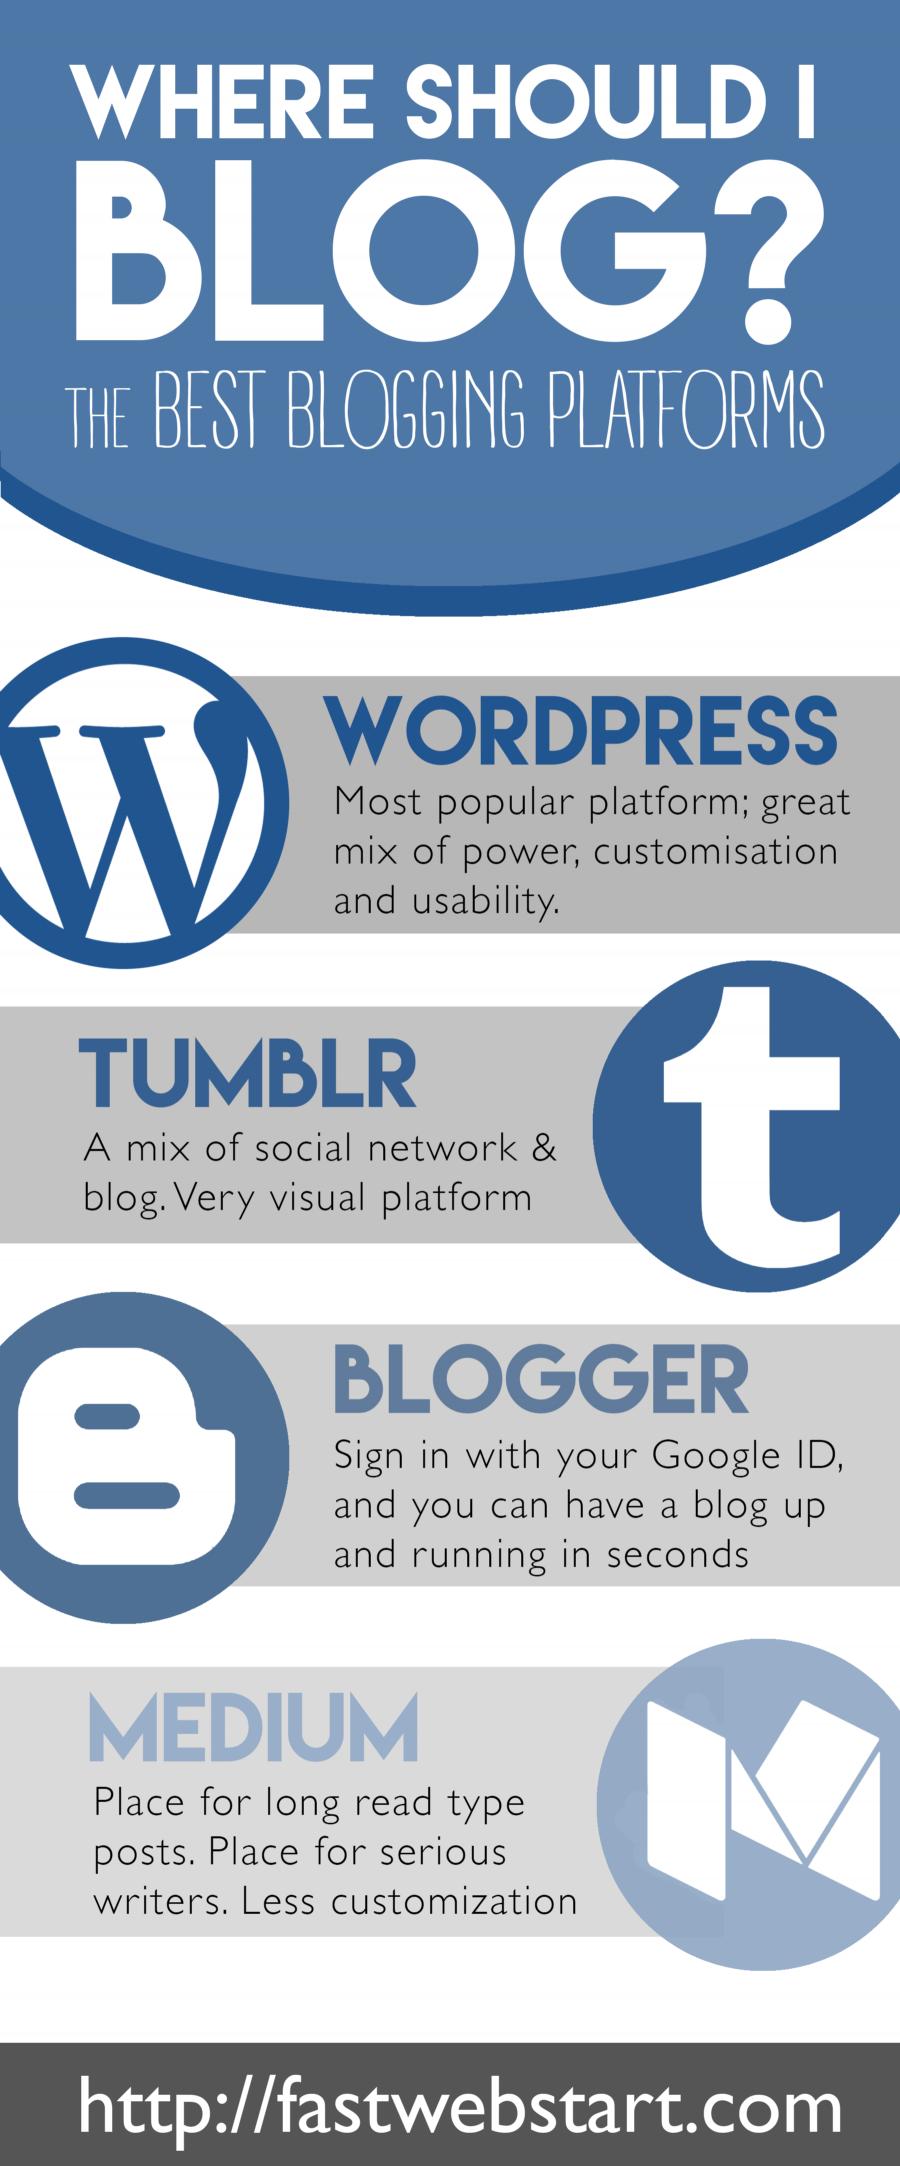 where should I blog